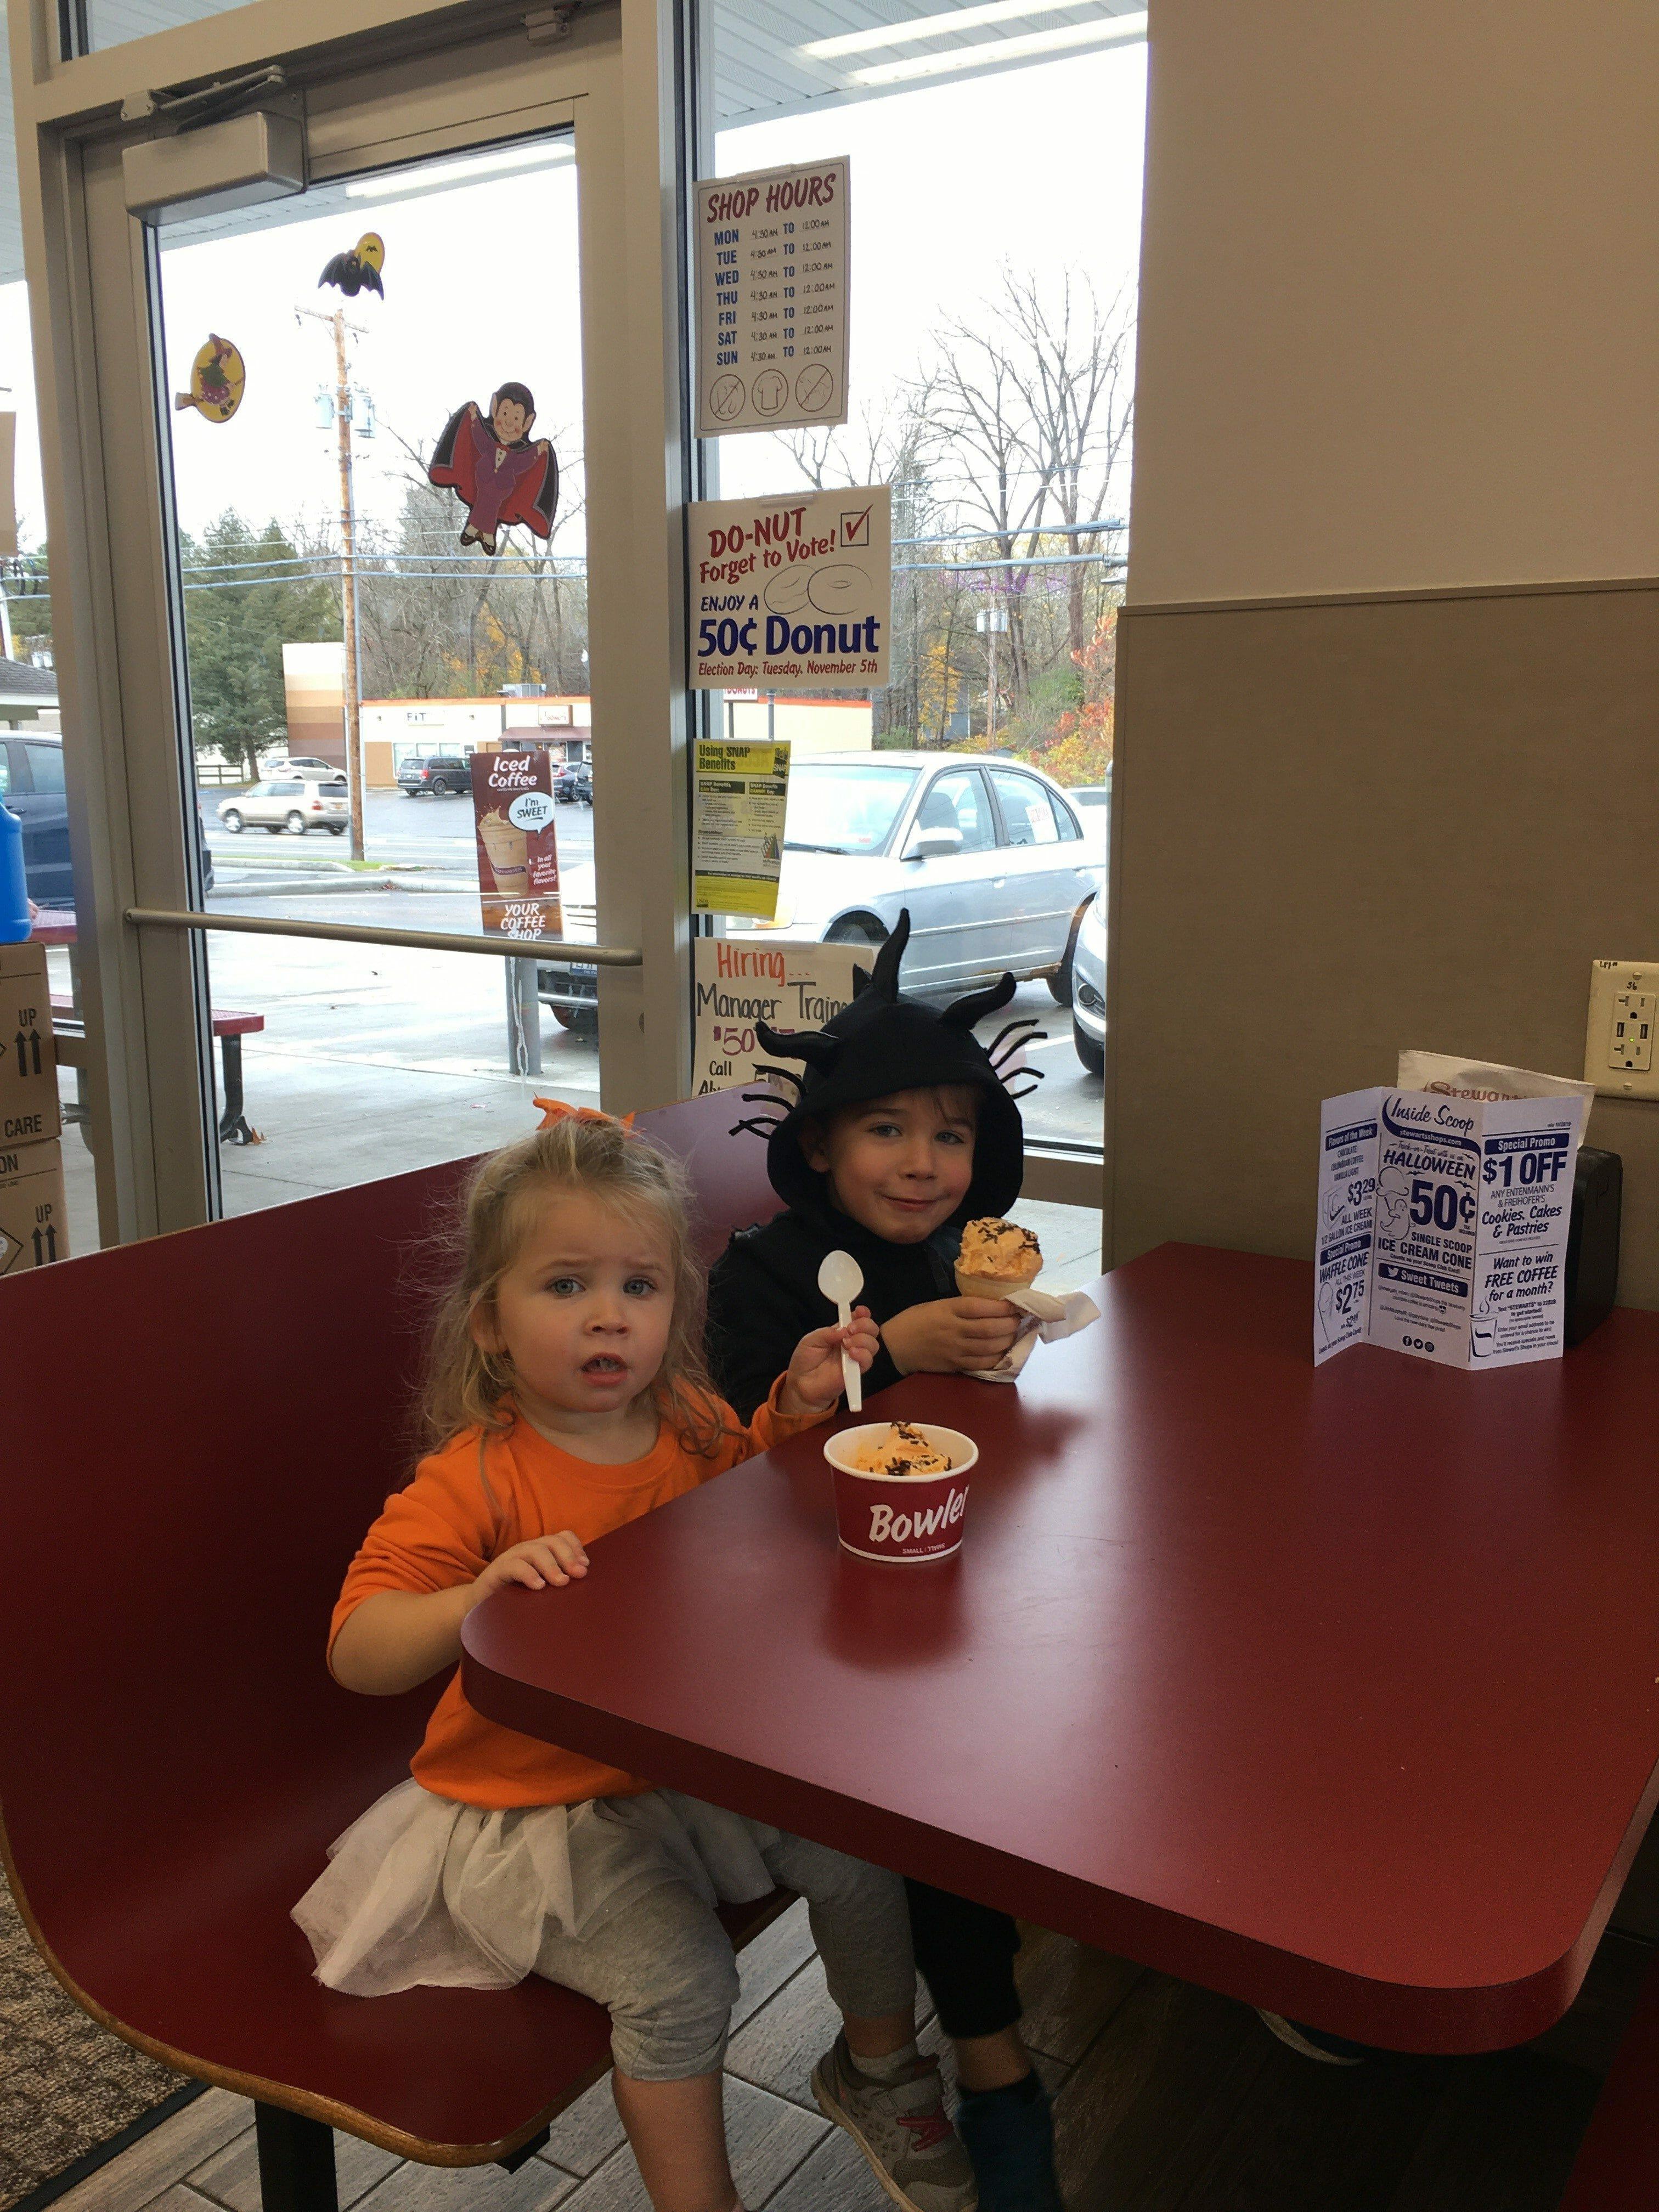 Little girls enjoying ice cream at Stewart's